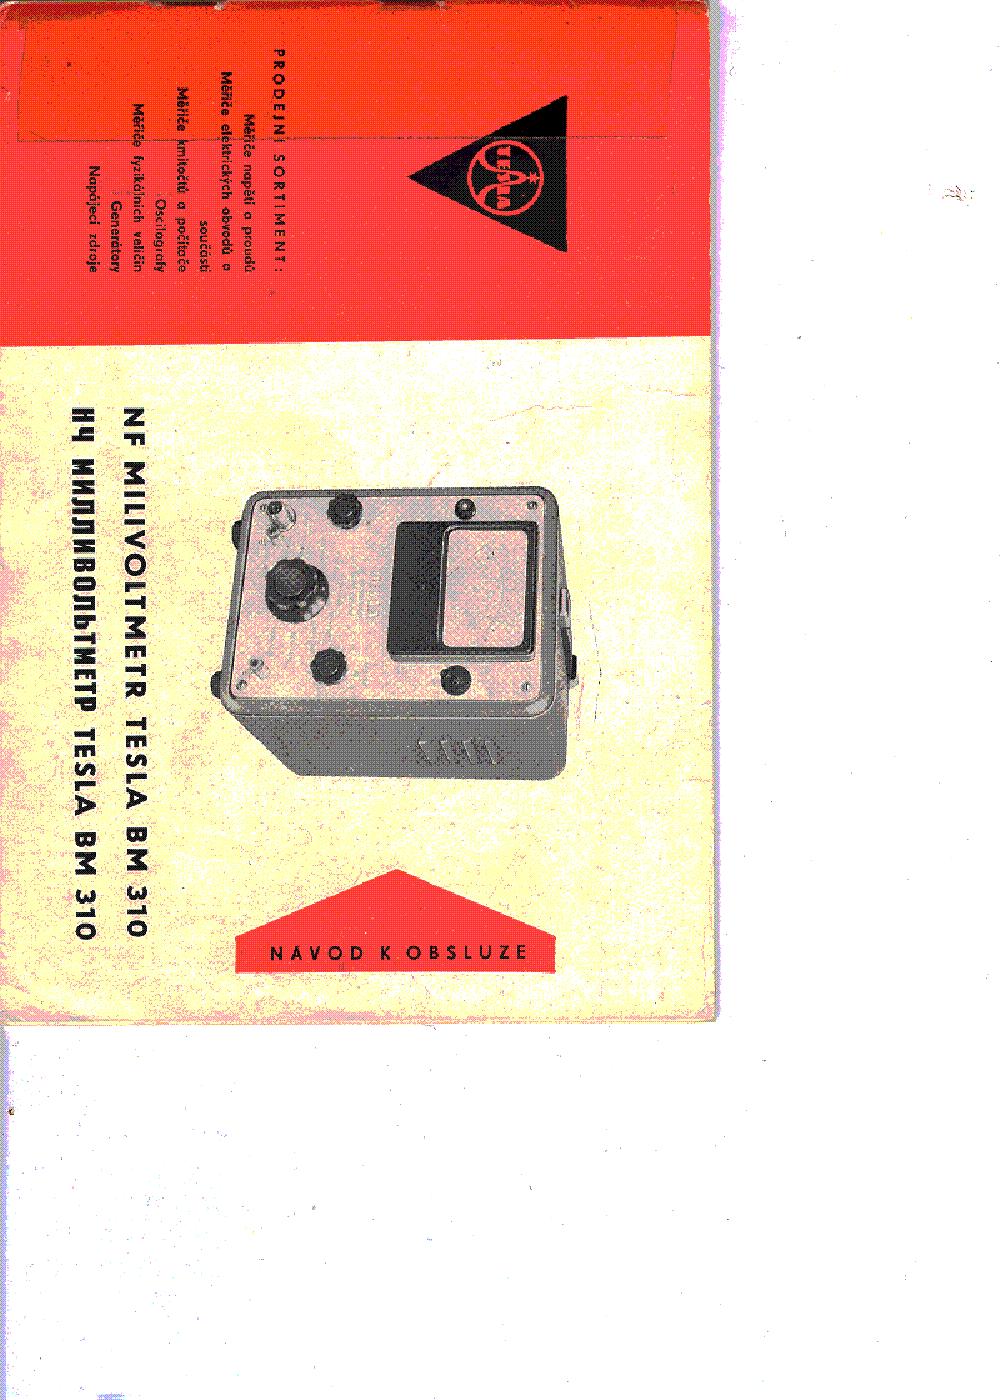 tesla owners manual blank